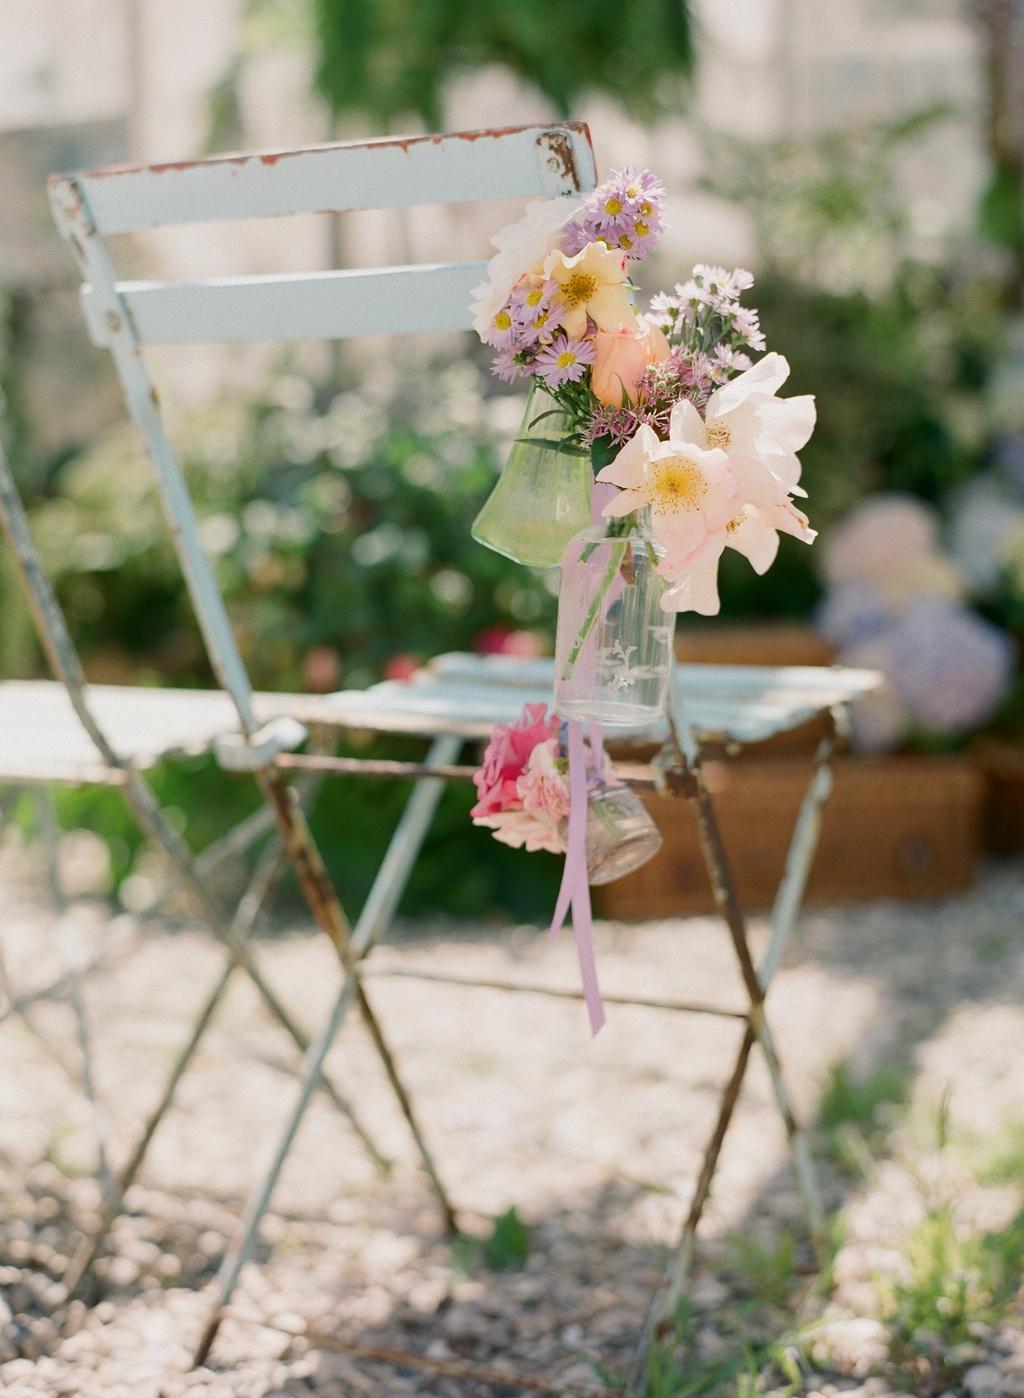 Styled-wedding-beaux-arts-tea-time-monique-lhuillier-santa-barbara-chic-flowers-chair-14.full